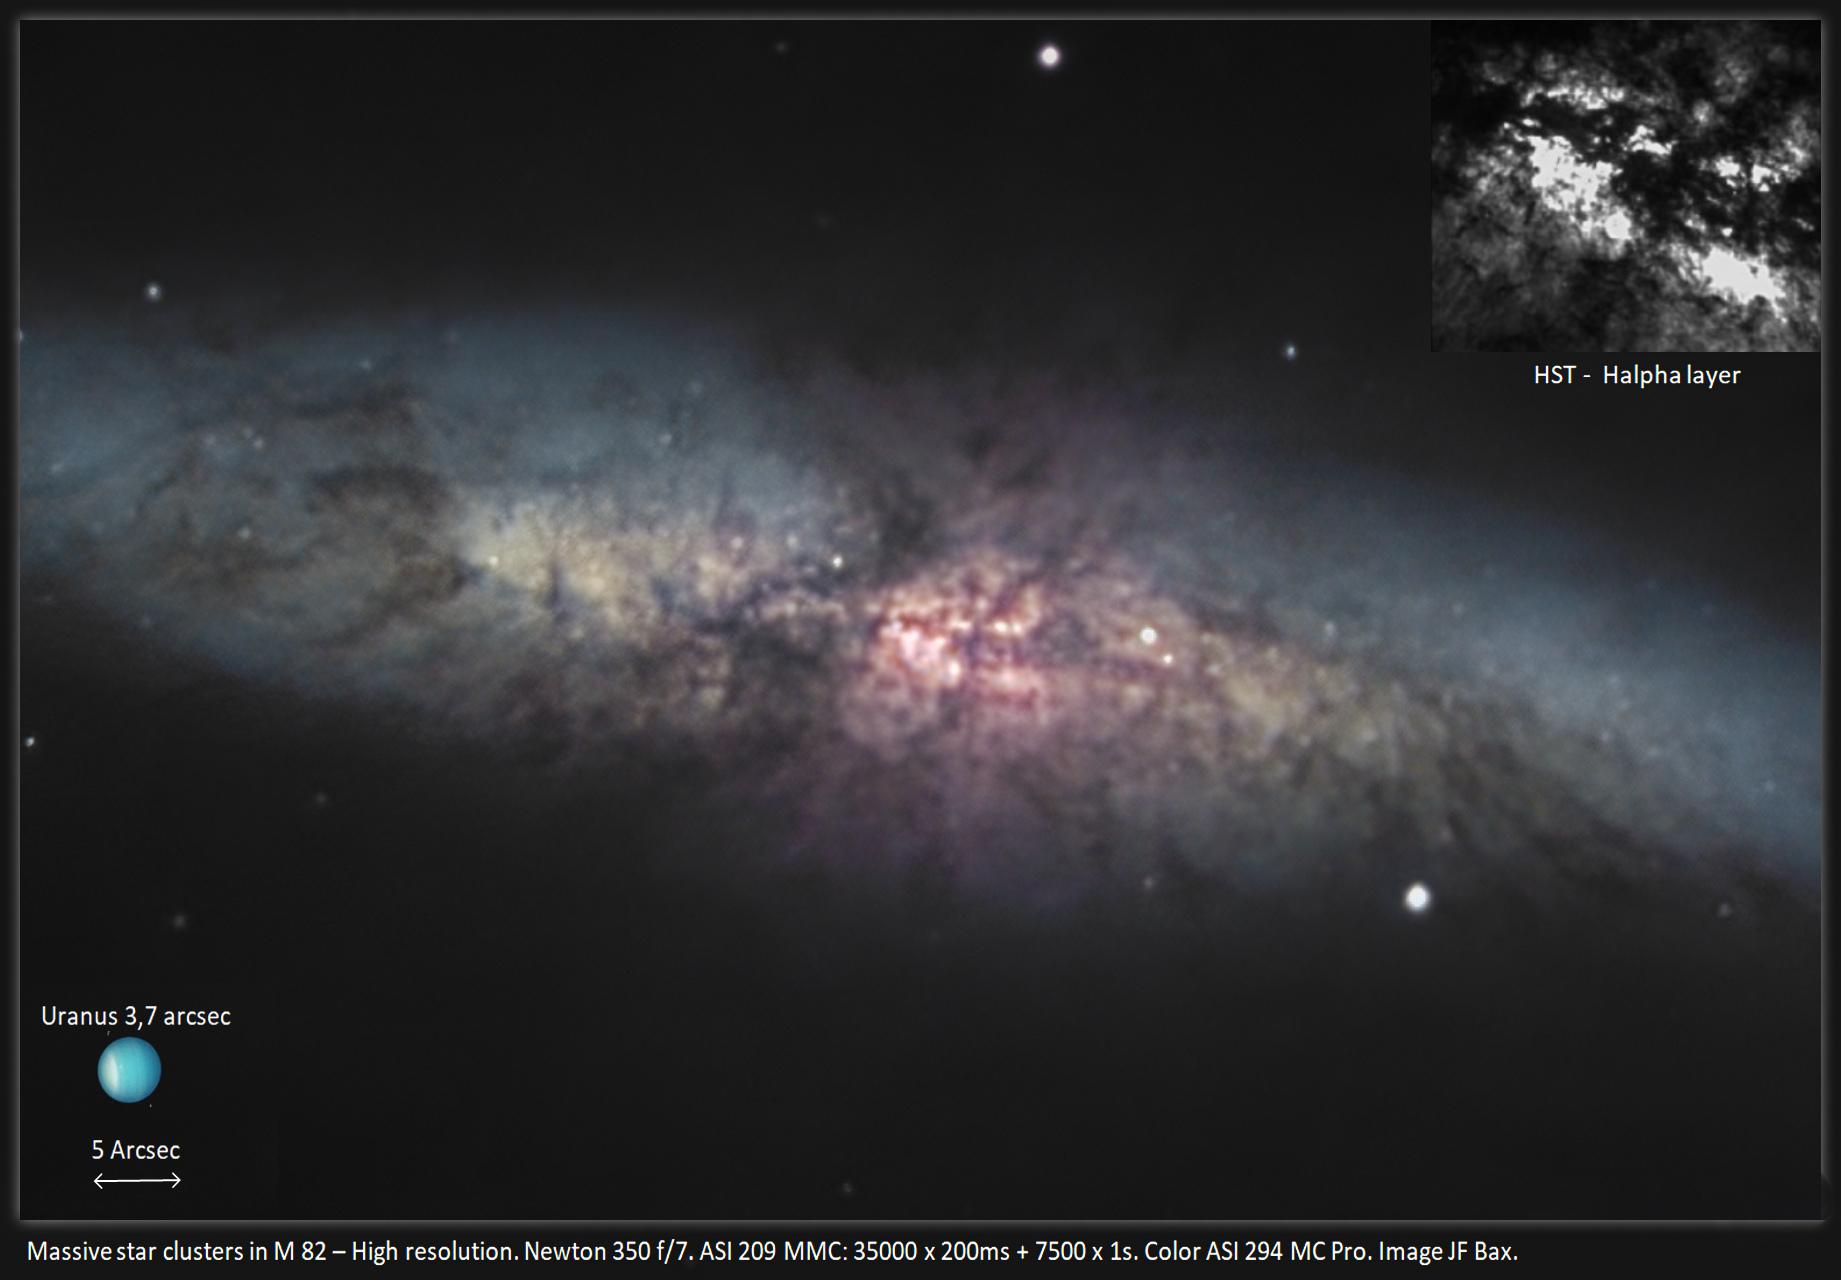 M82-amas6_web_uranus.jpg.b66af1252ab7b50d2caa2896cde27efb.jpg